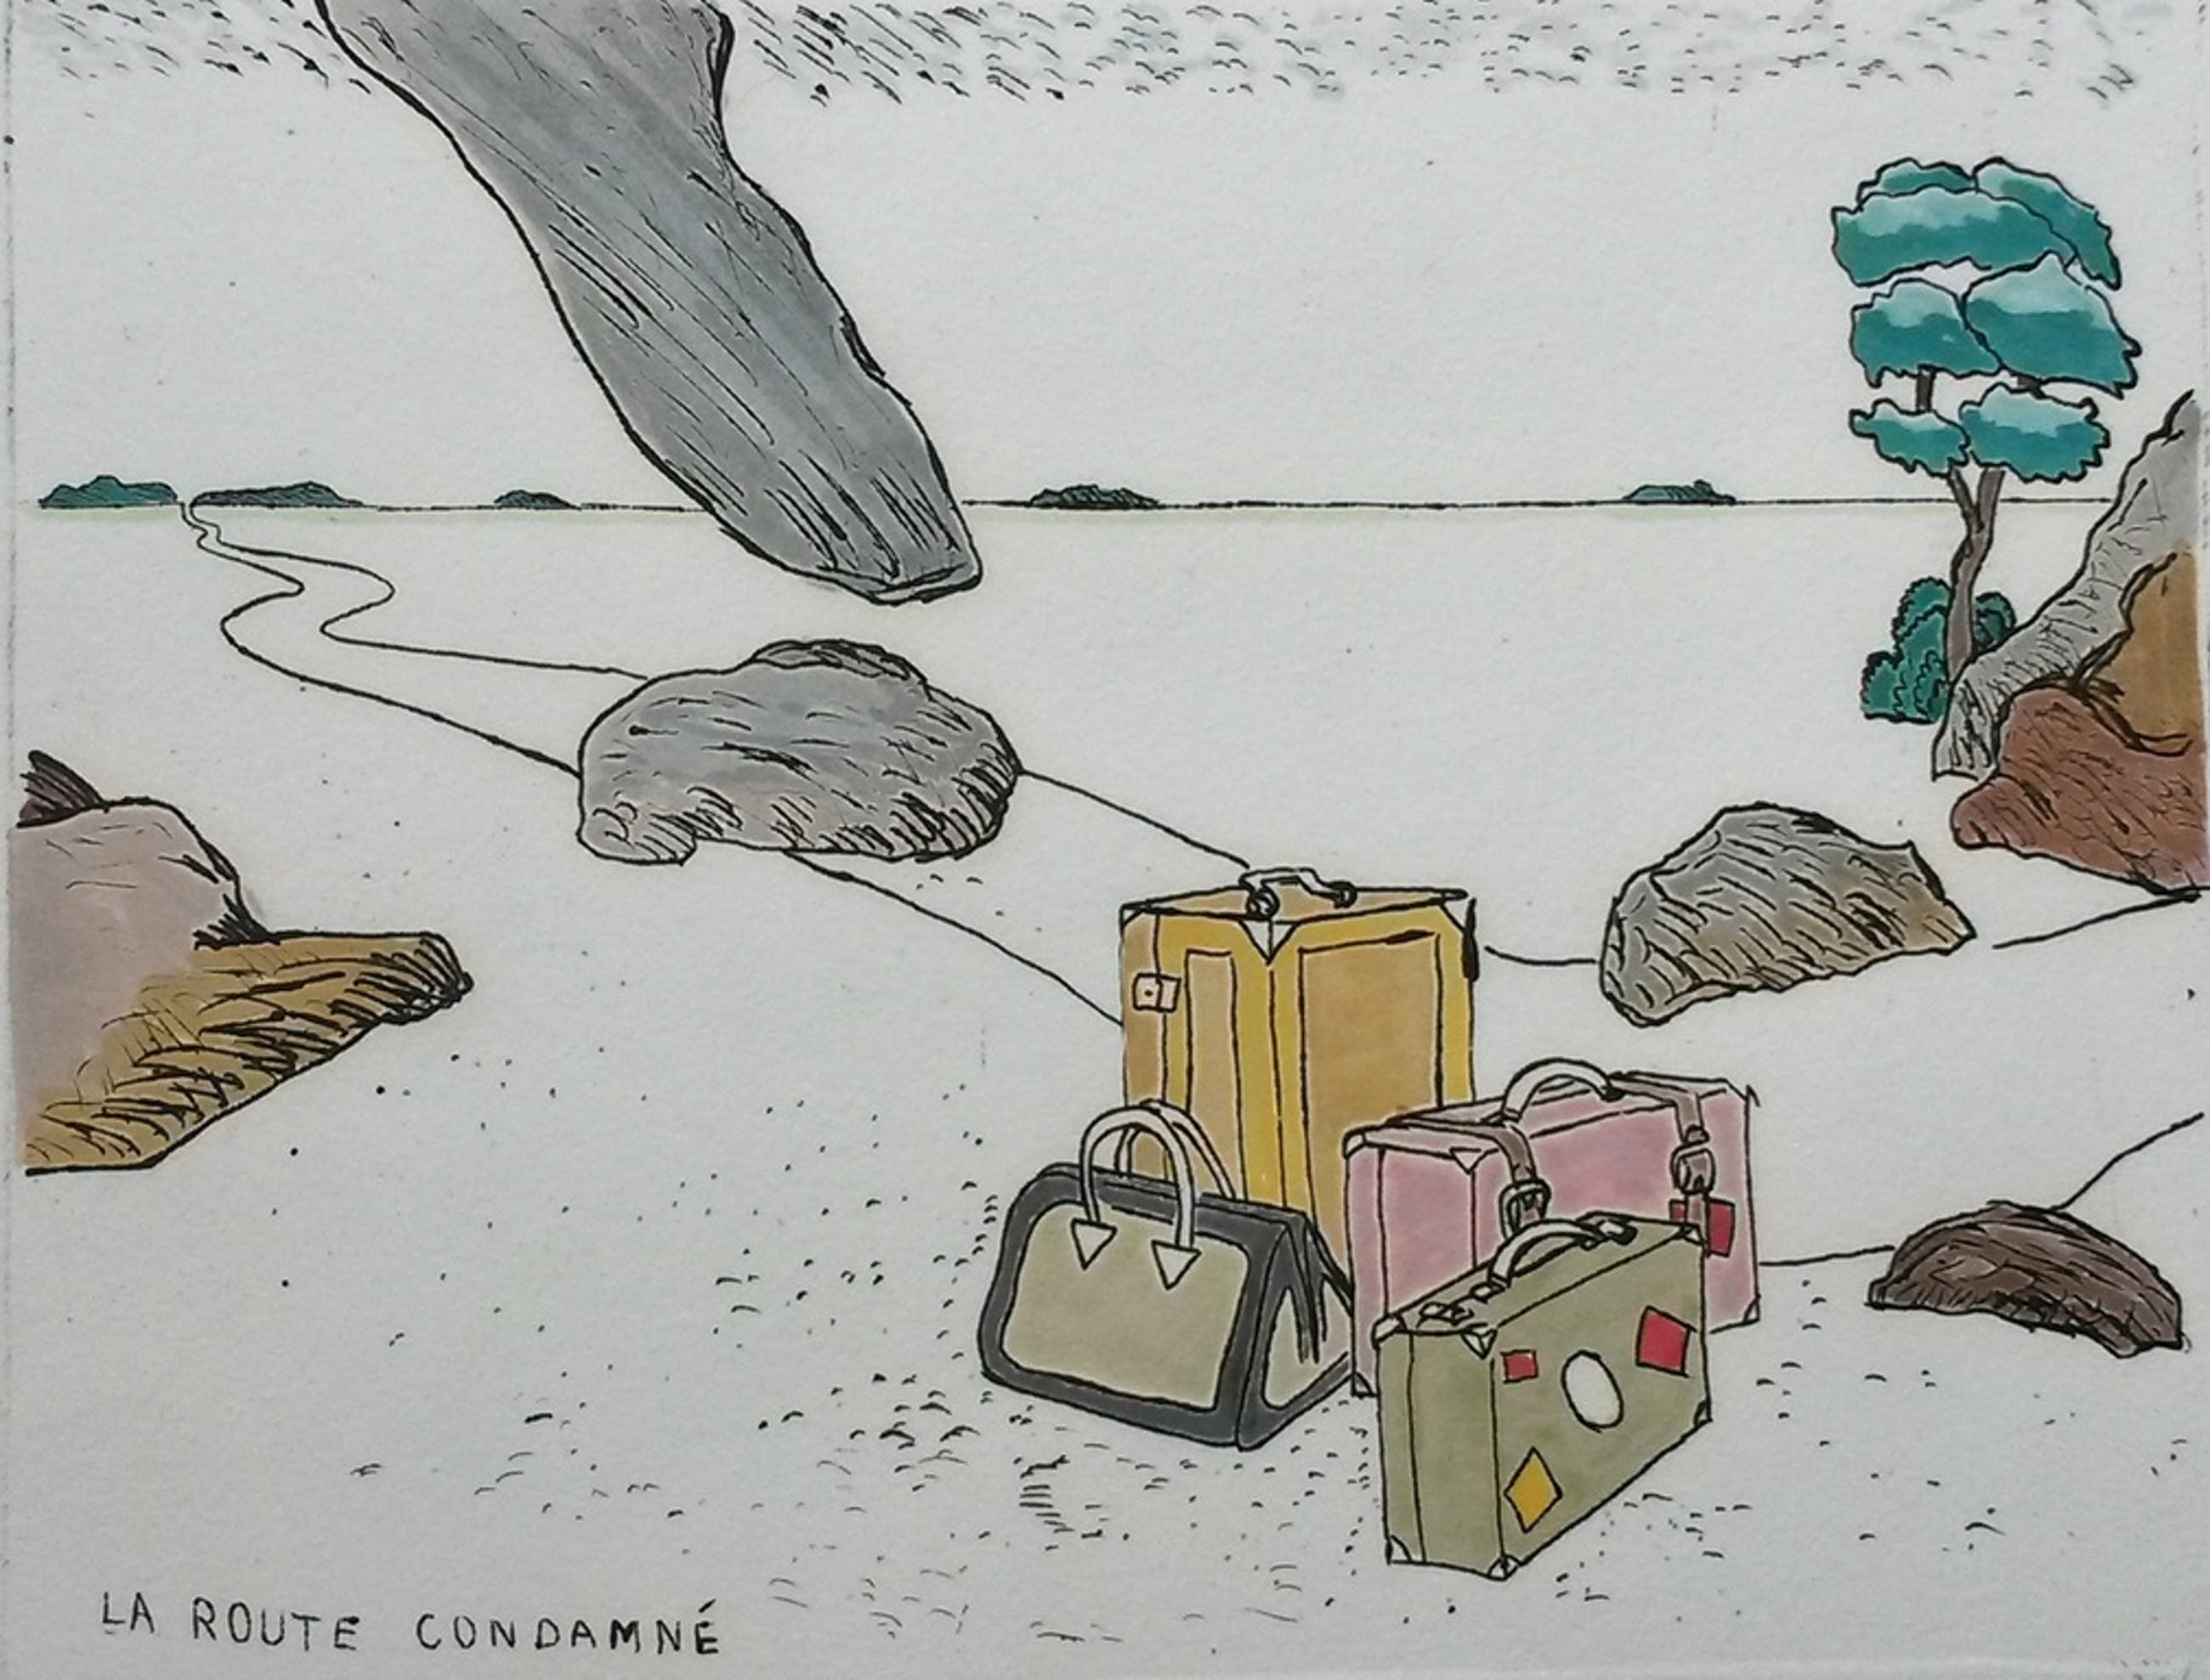 Pieter Holstein - La route condamné - ingekleurde ets kopen? Bied vanaf 65!